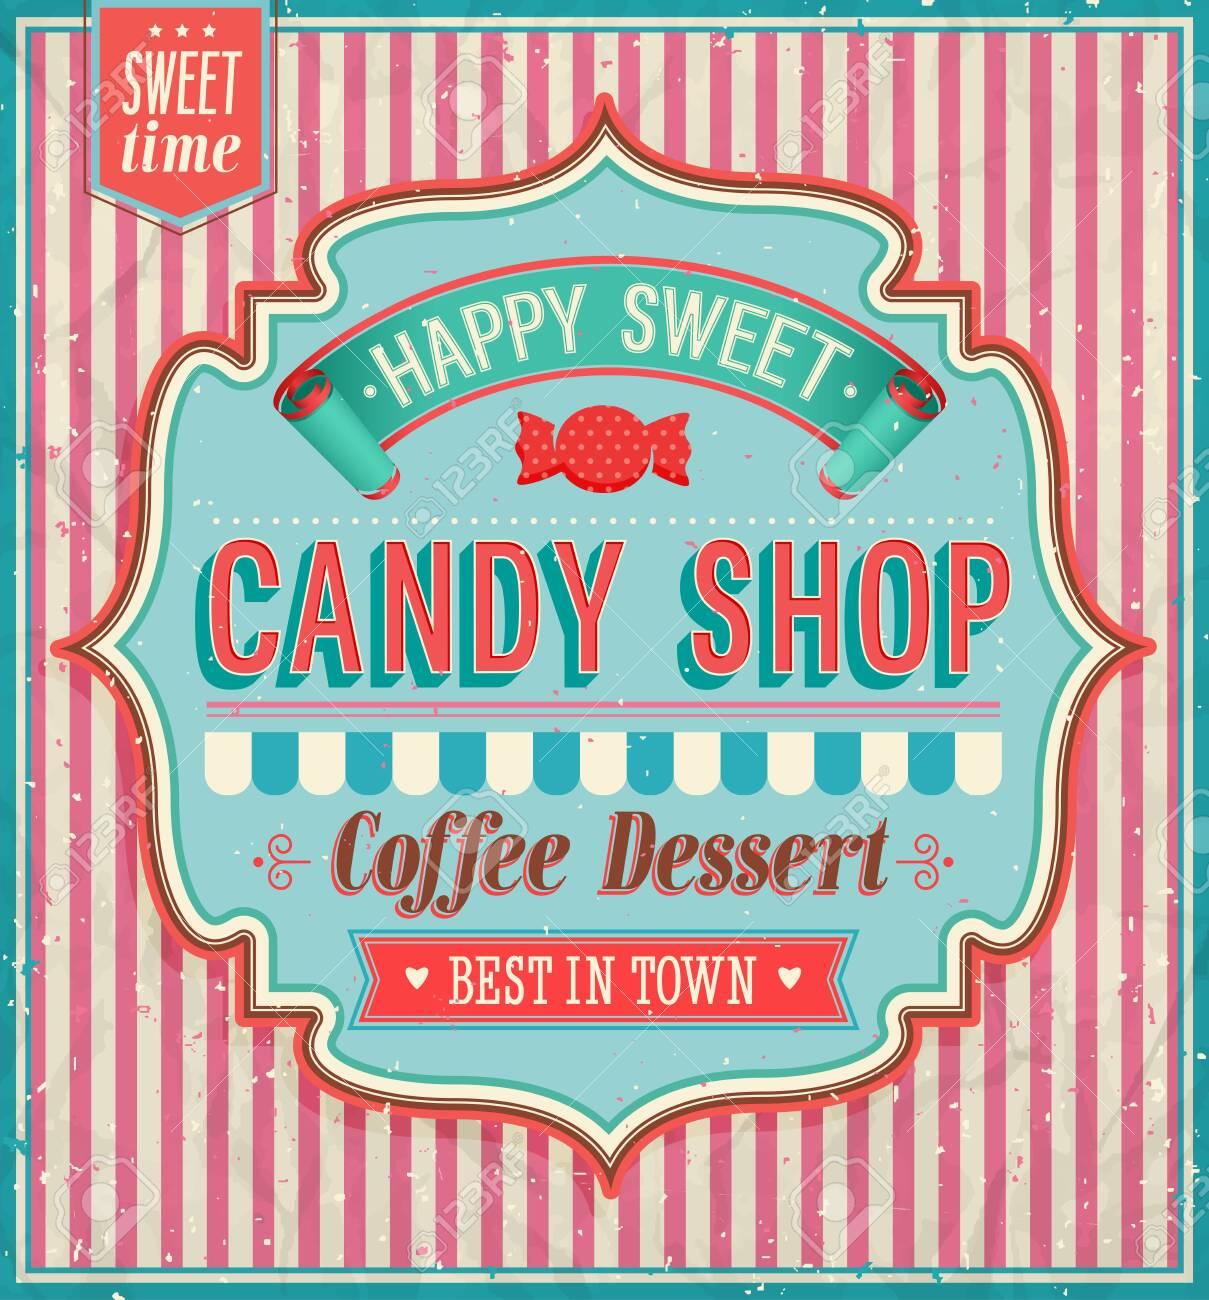 Candy shop. Vector illustration. - 26935154